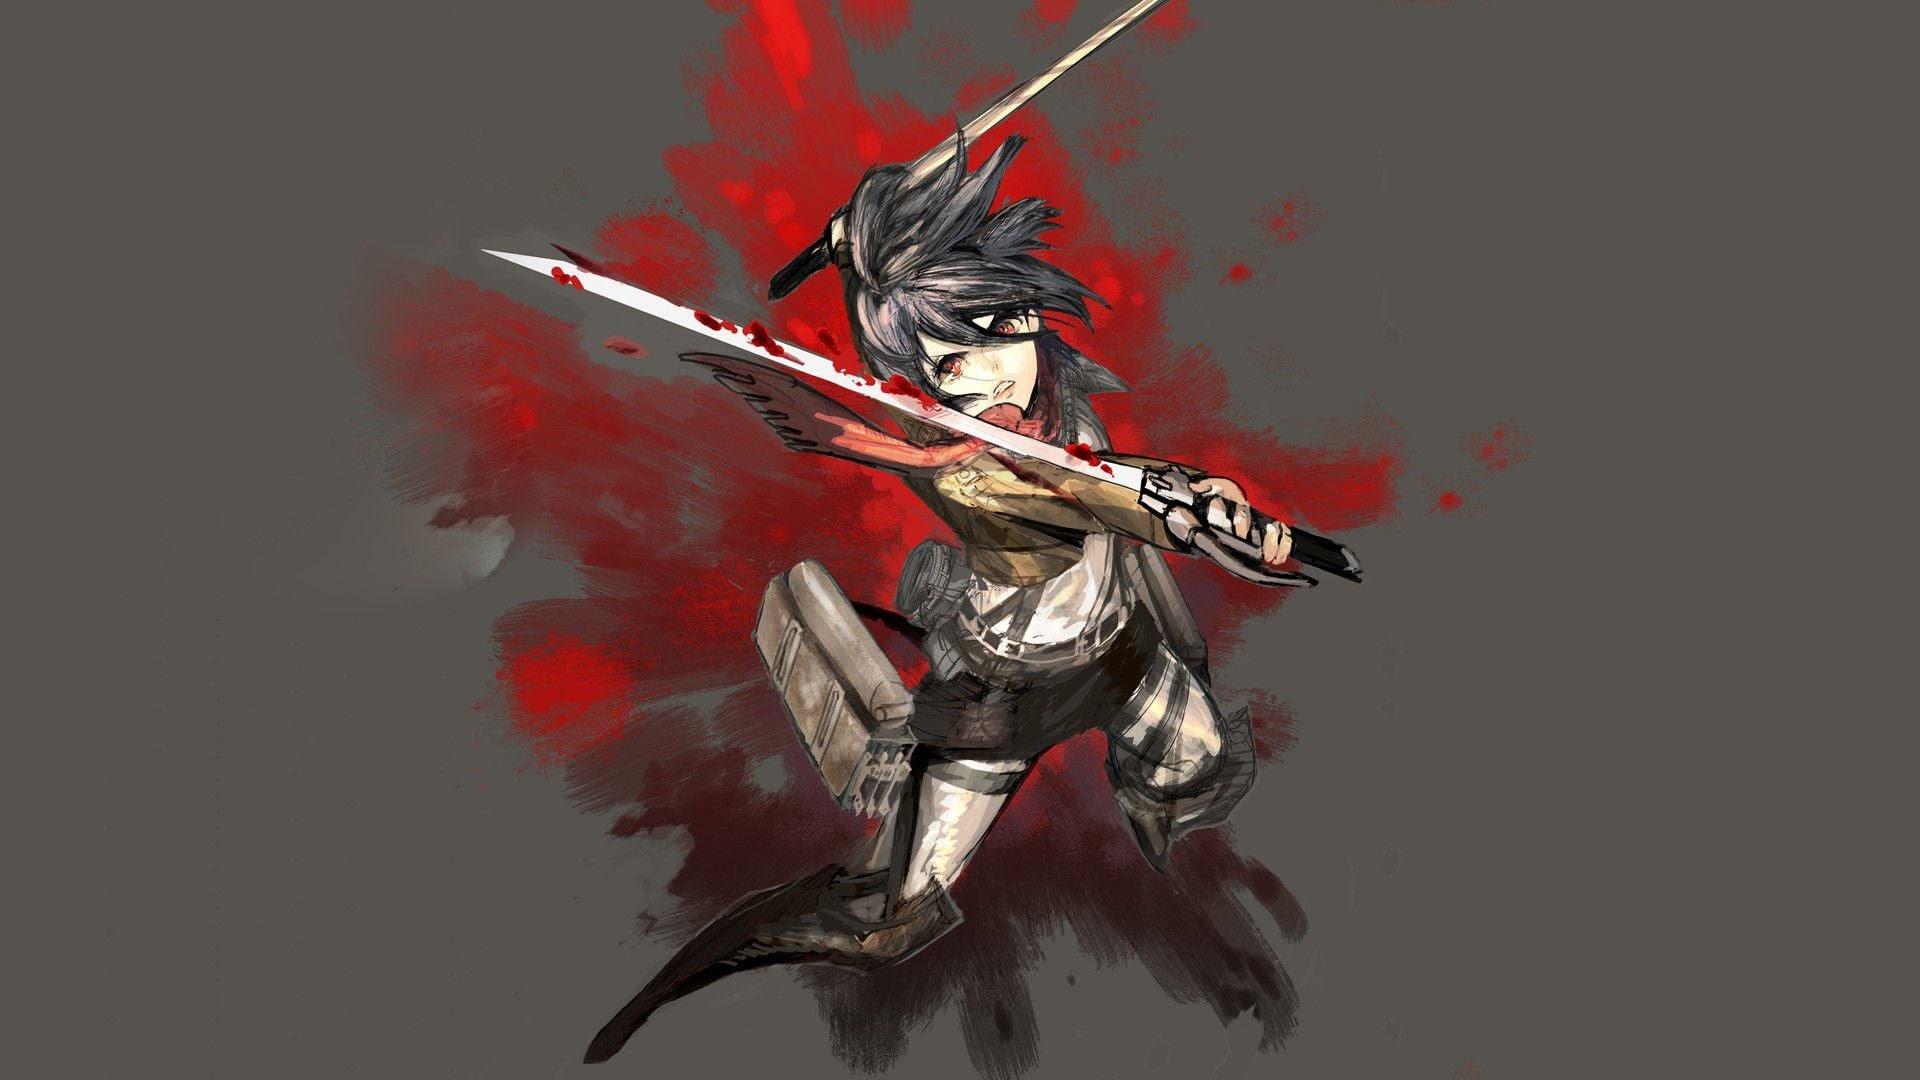 Attack On Titan Mikasa Wallpaper Gambarku